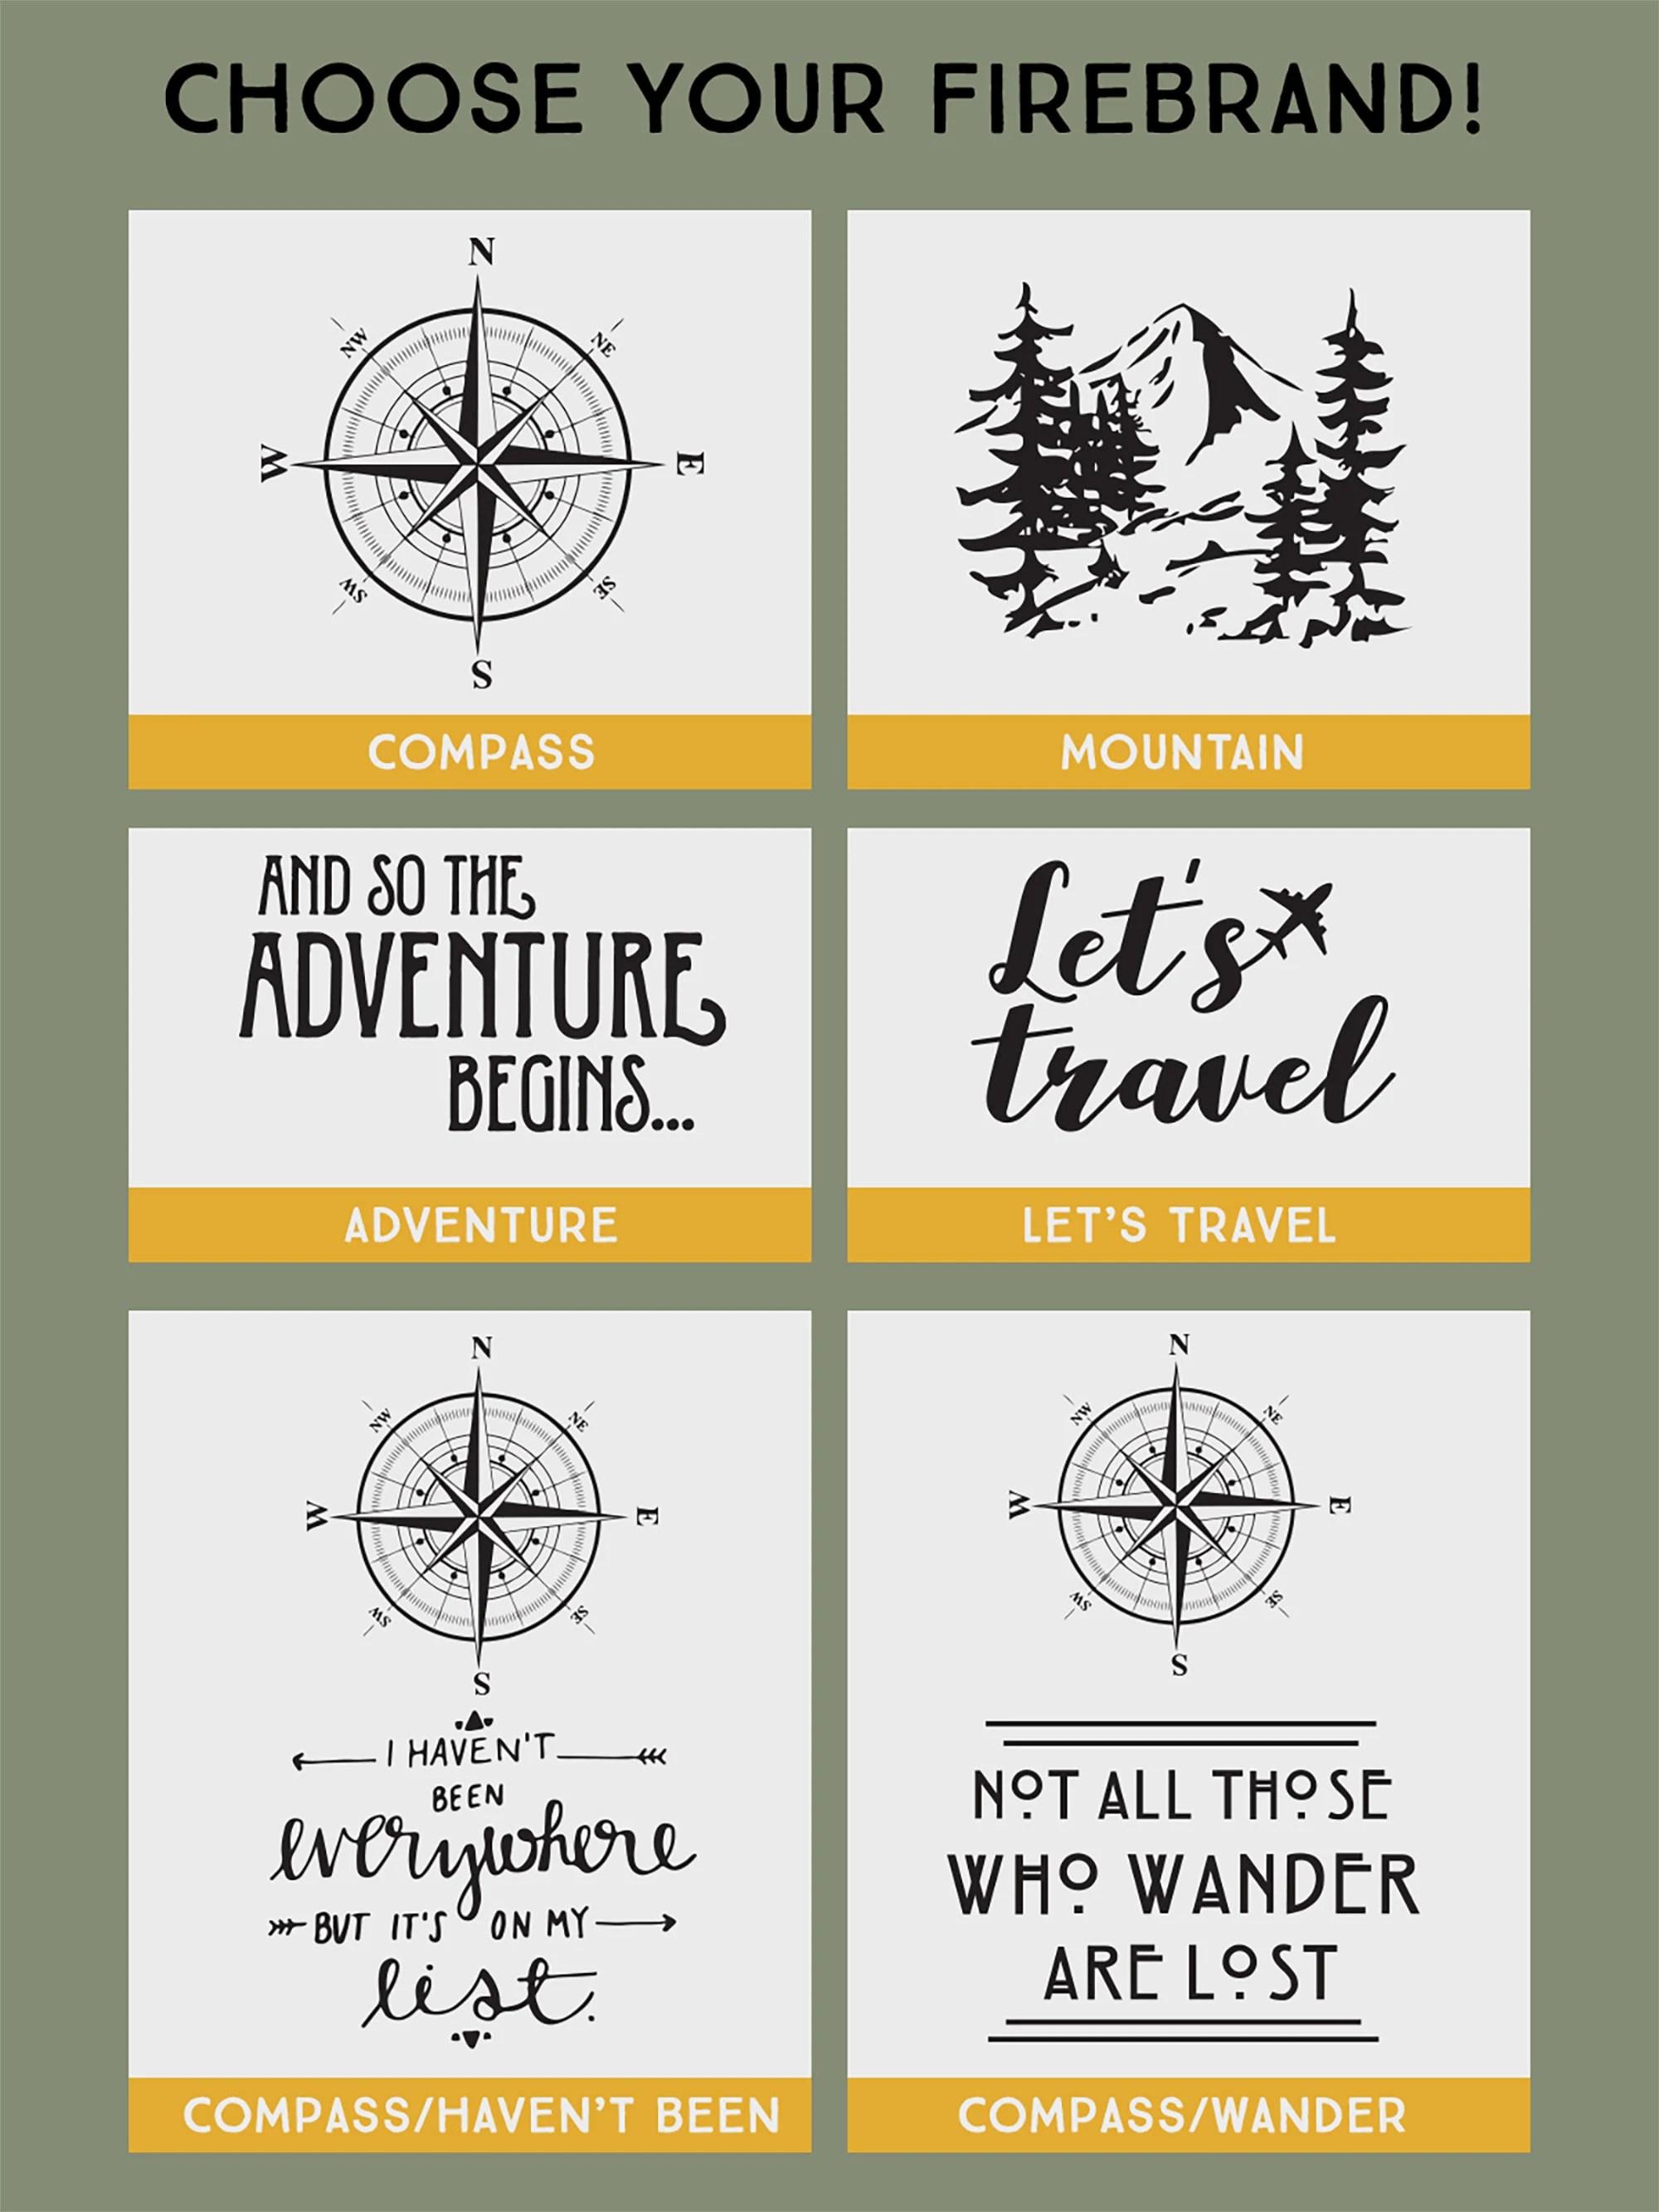 Passport Cover Travel Passport Personalized Cover... Custom image 9